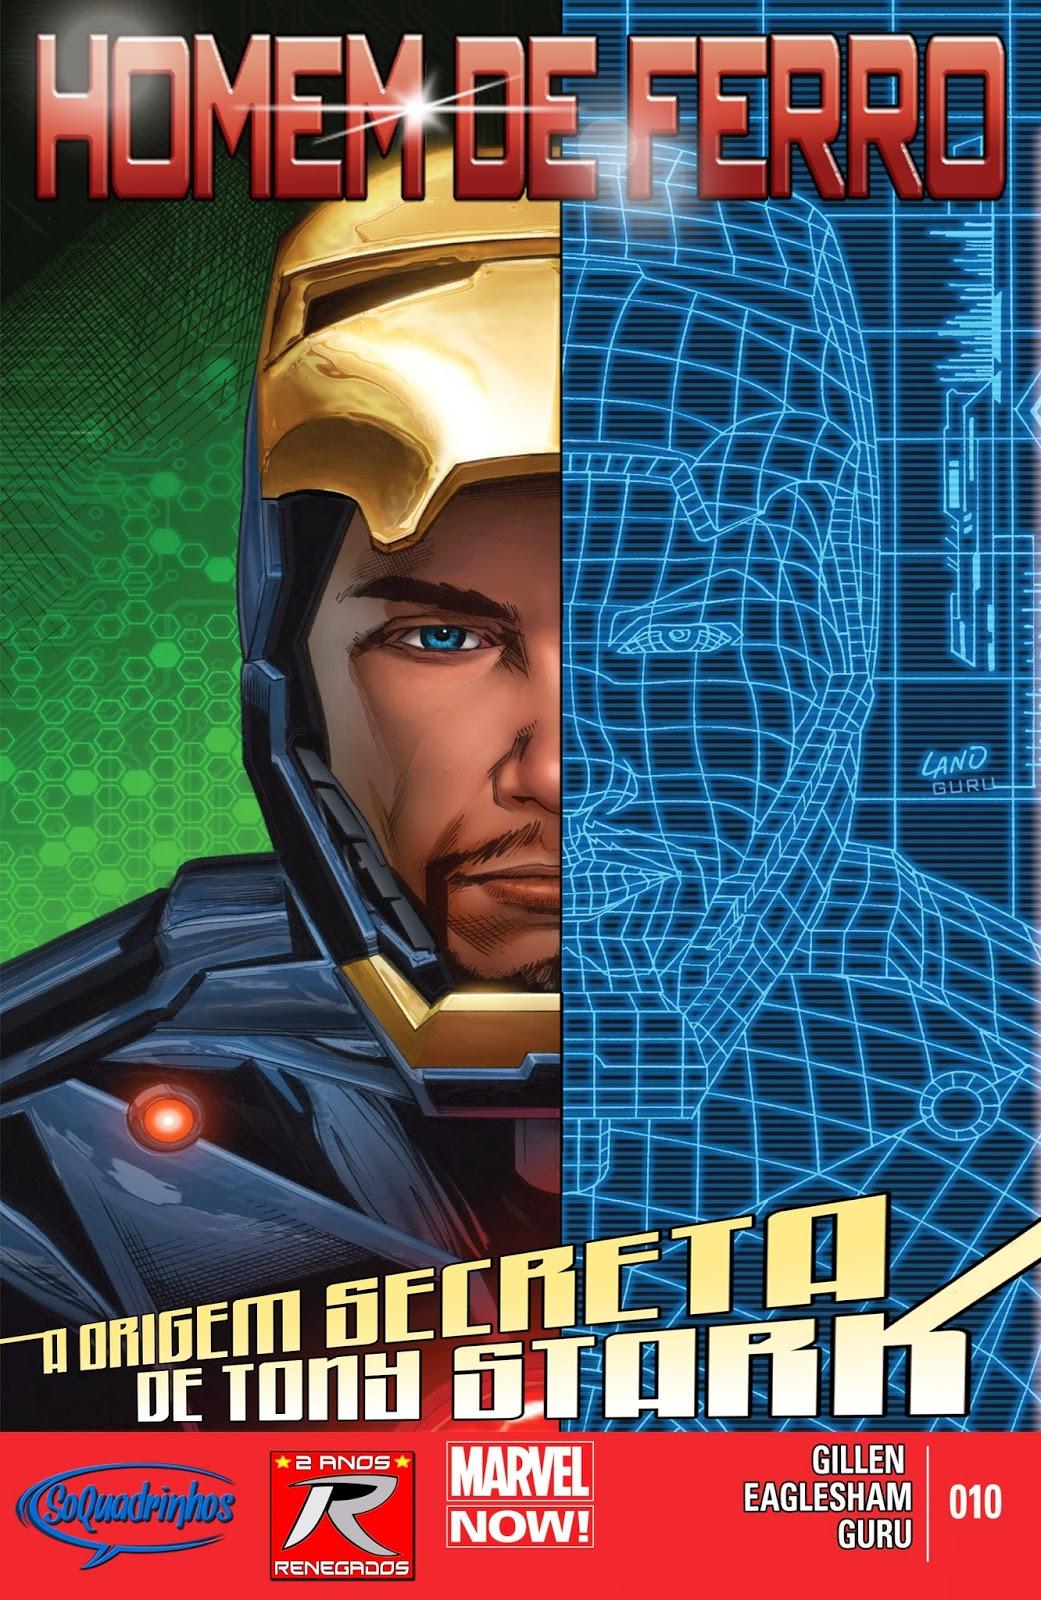 Nova Marvel! Homem de Ferro v6 #10